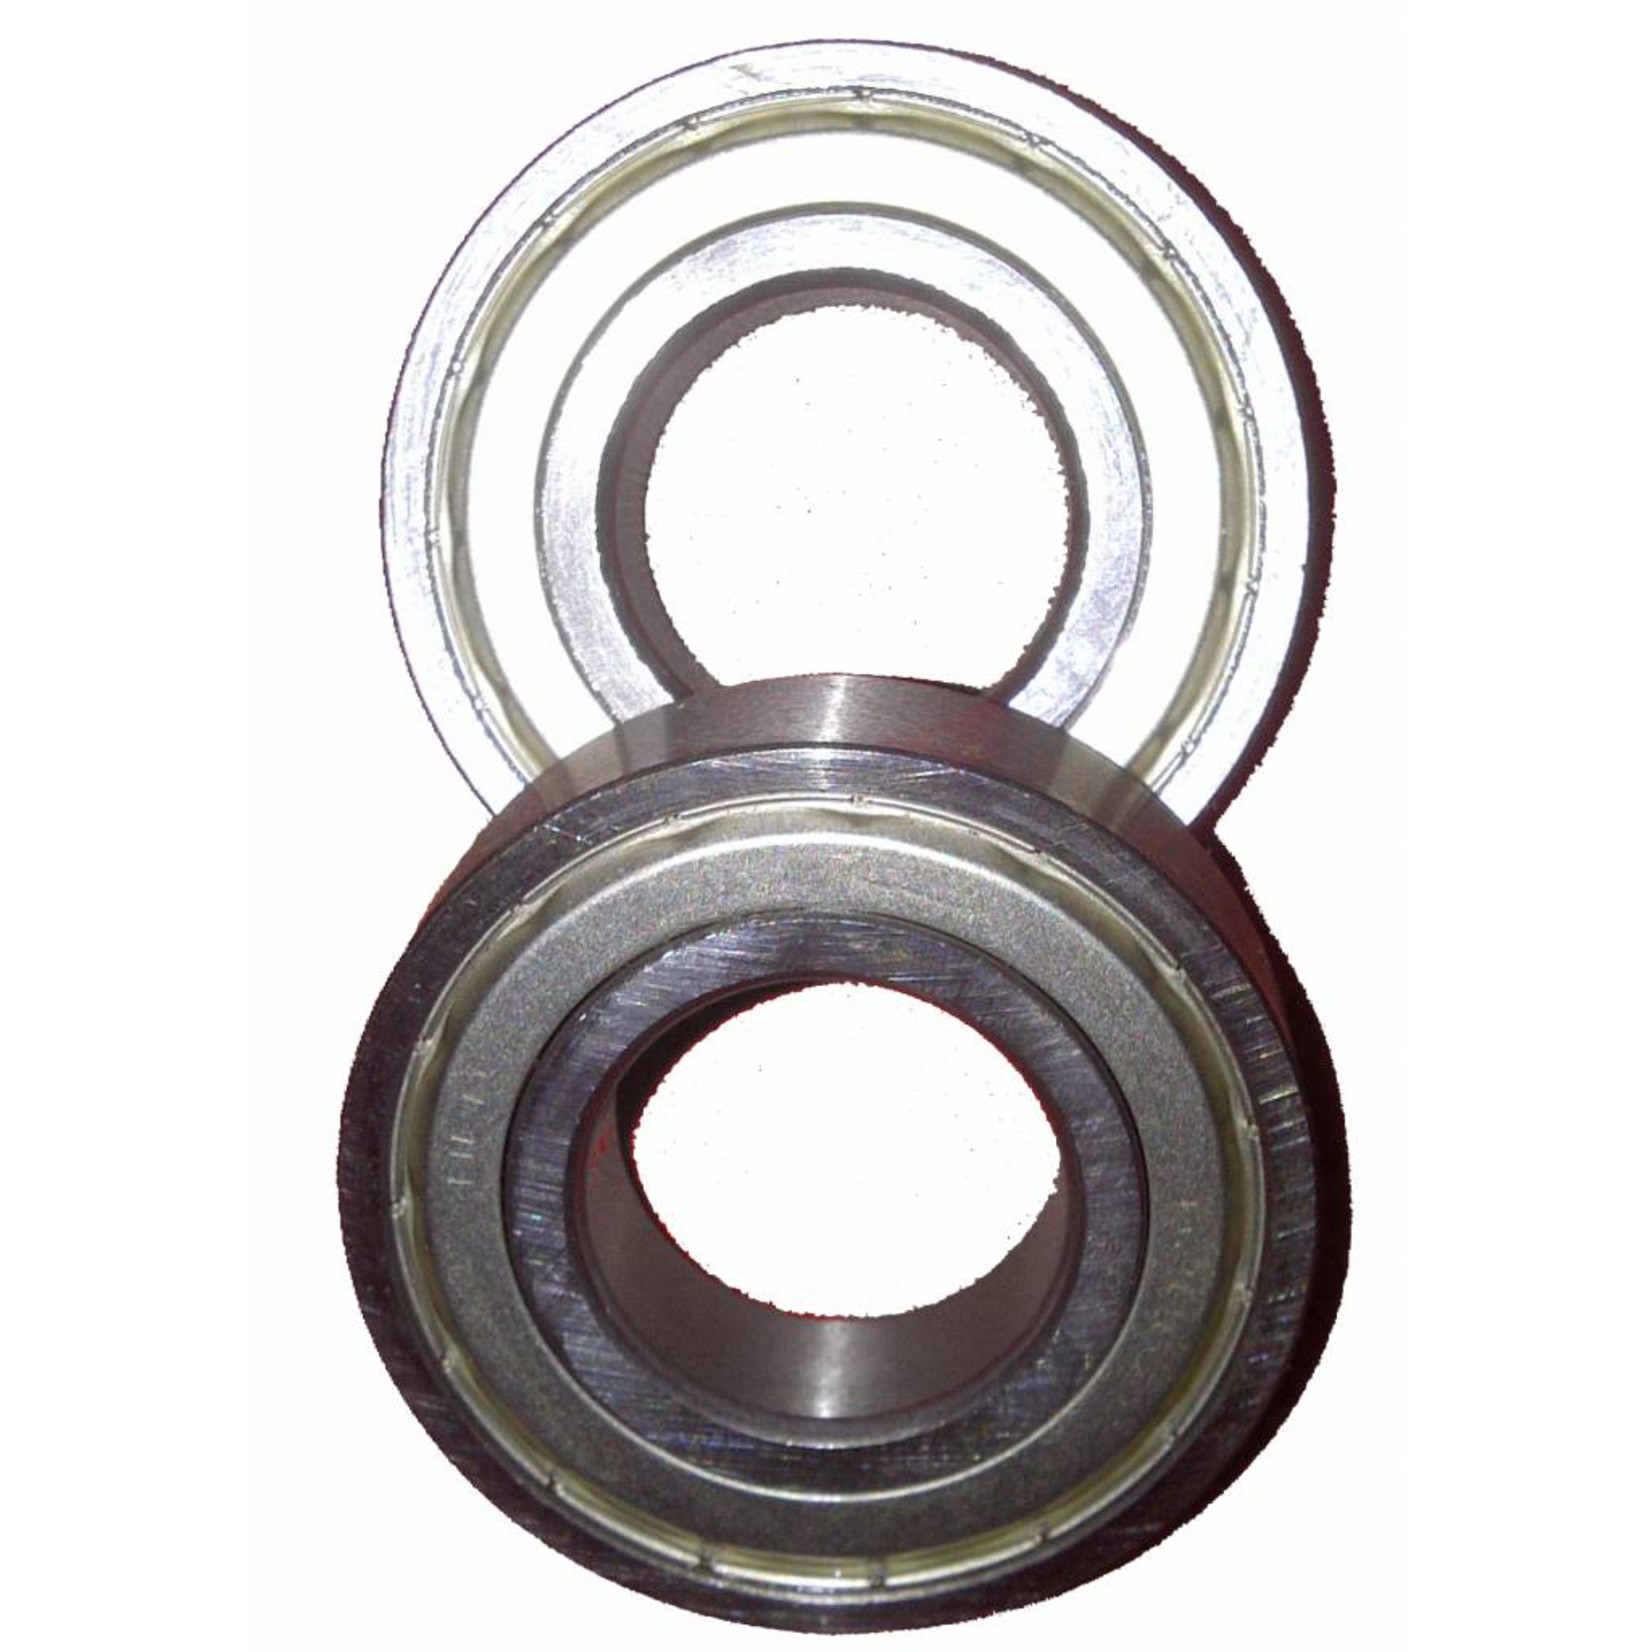 Primary shaft bearing 66- Nr Org: ZC9620159